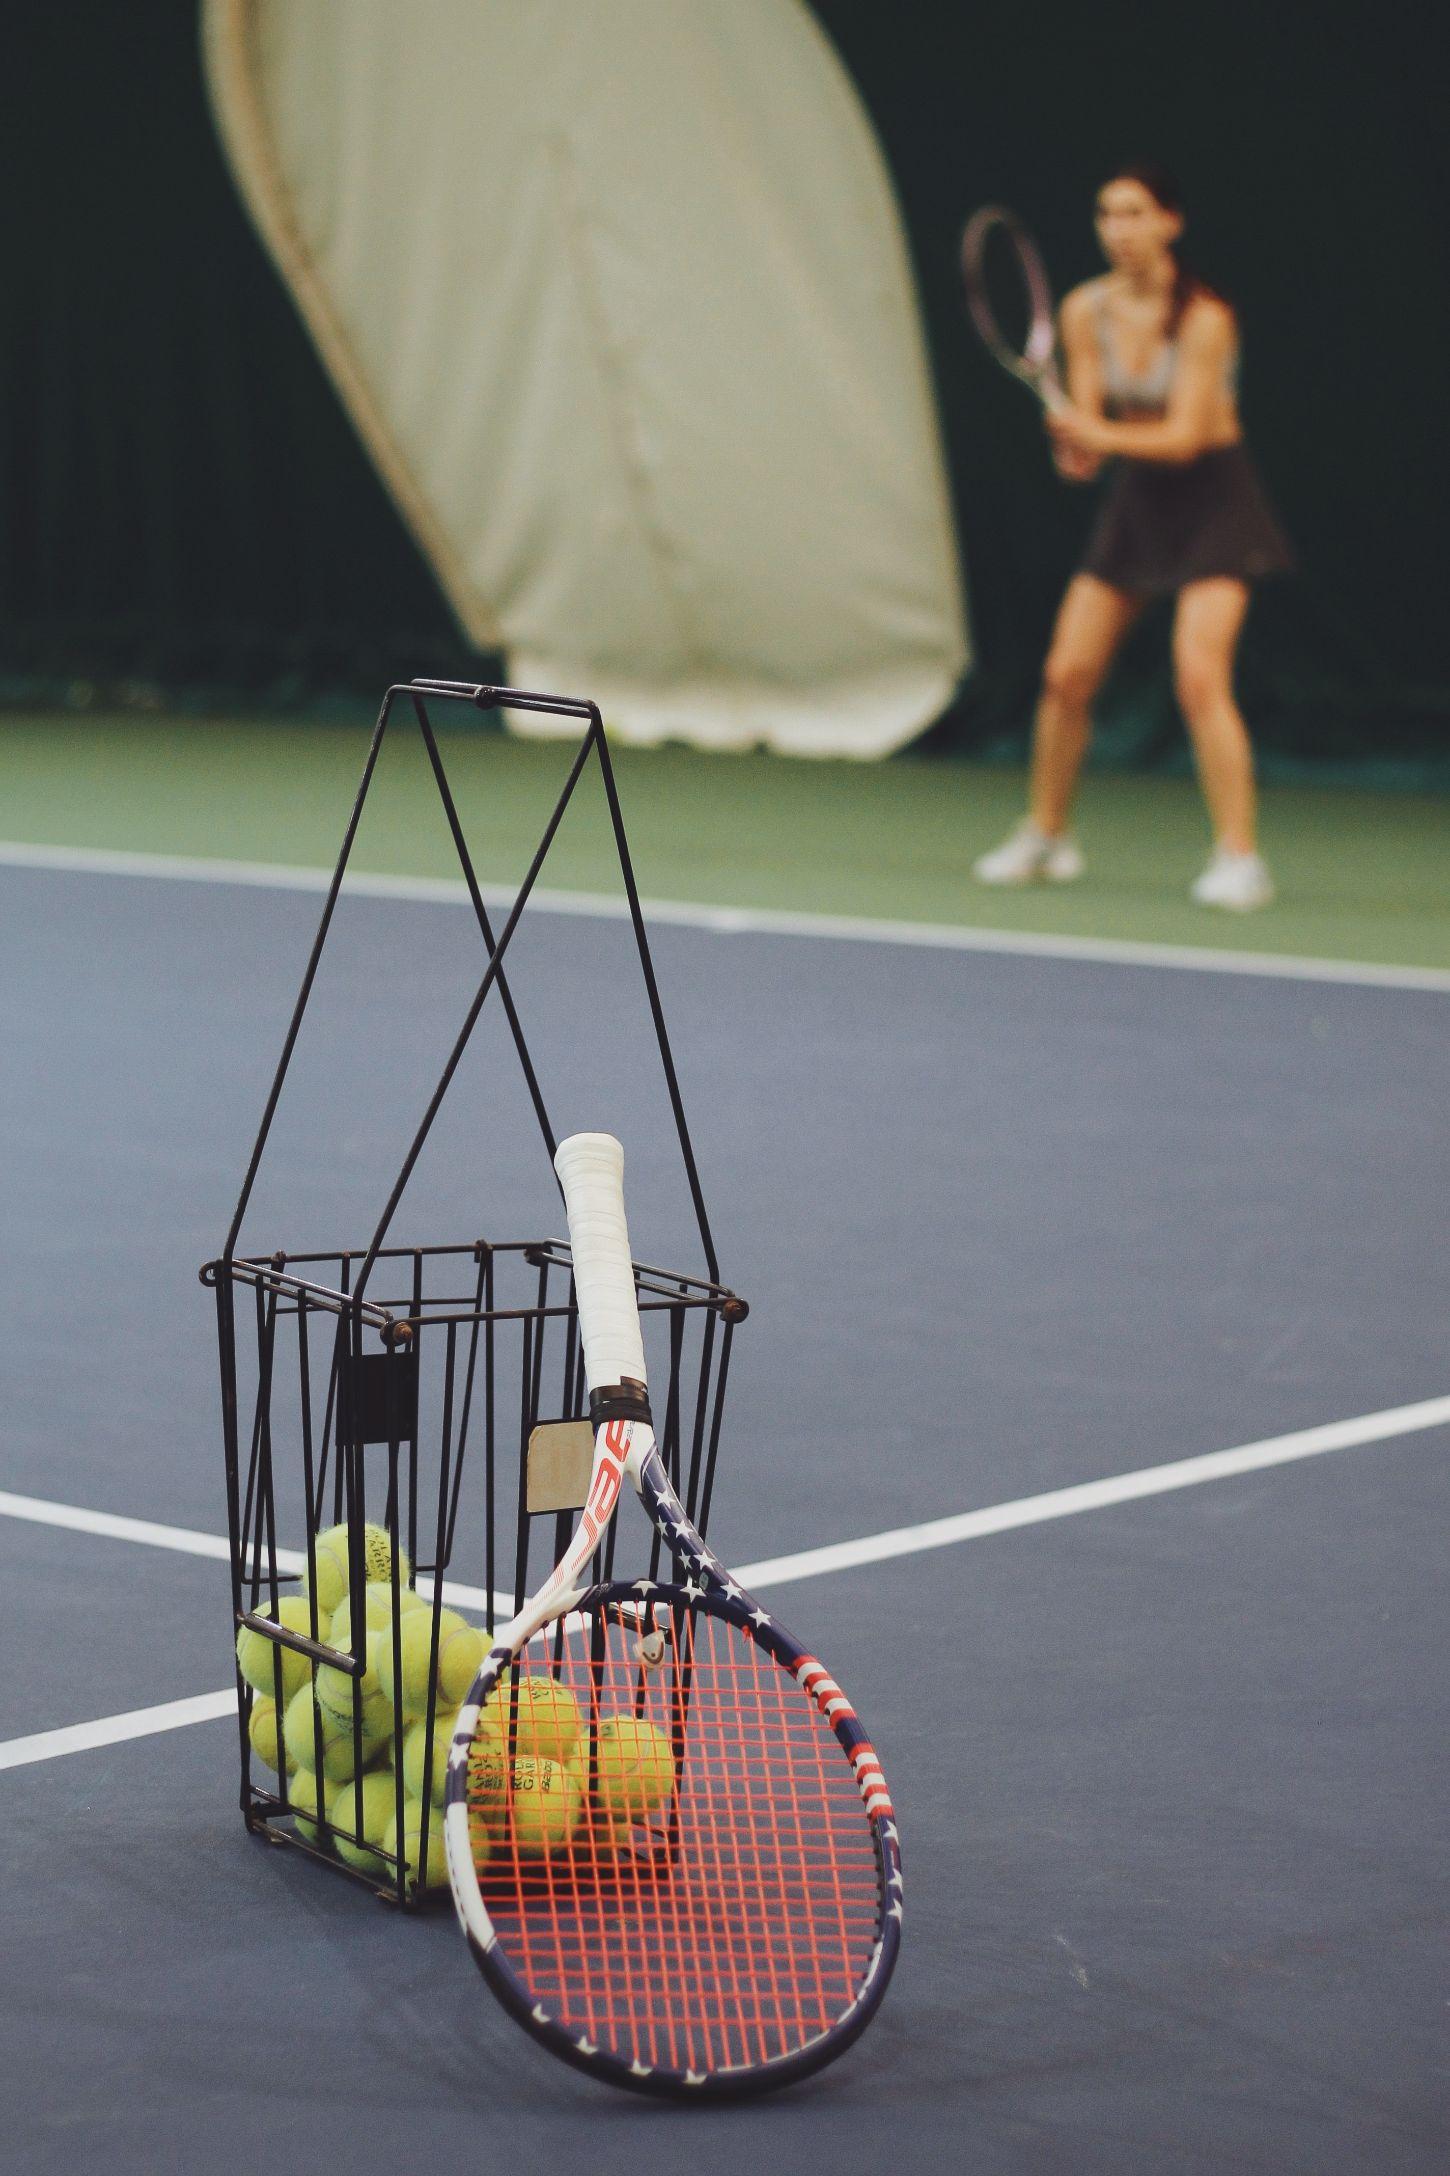 tennis balls and racket on a tennis court